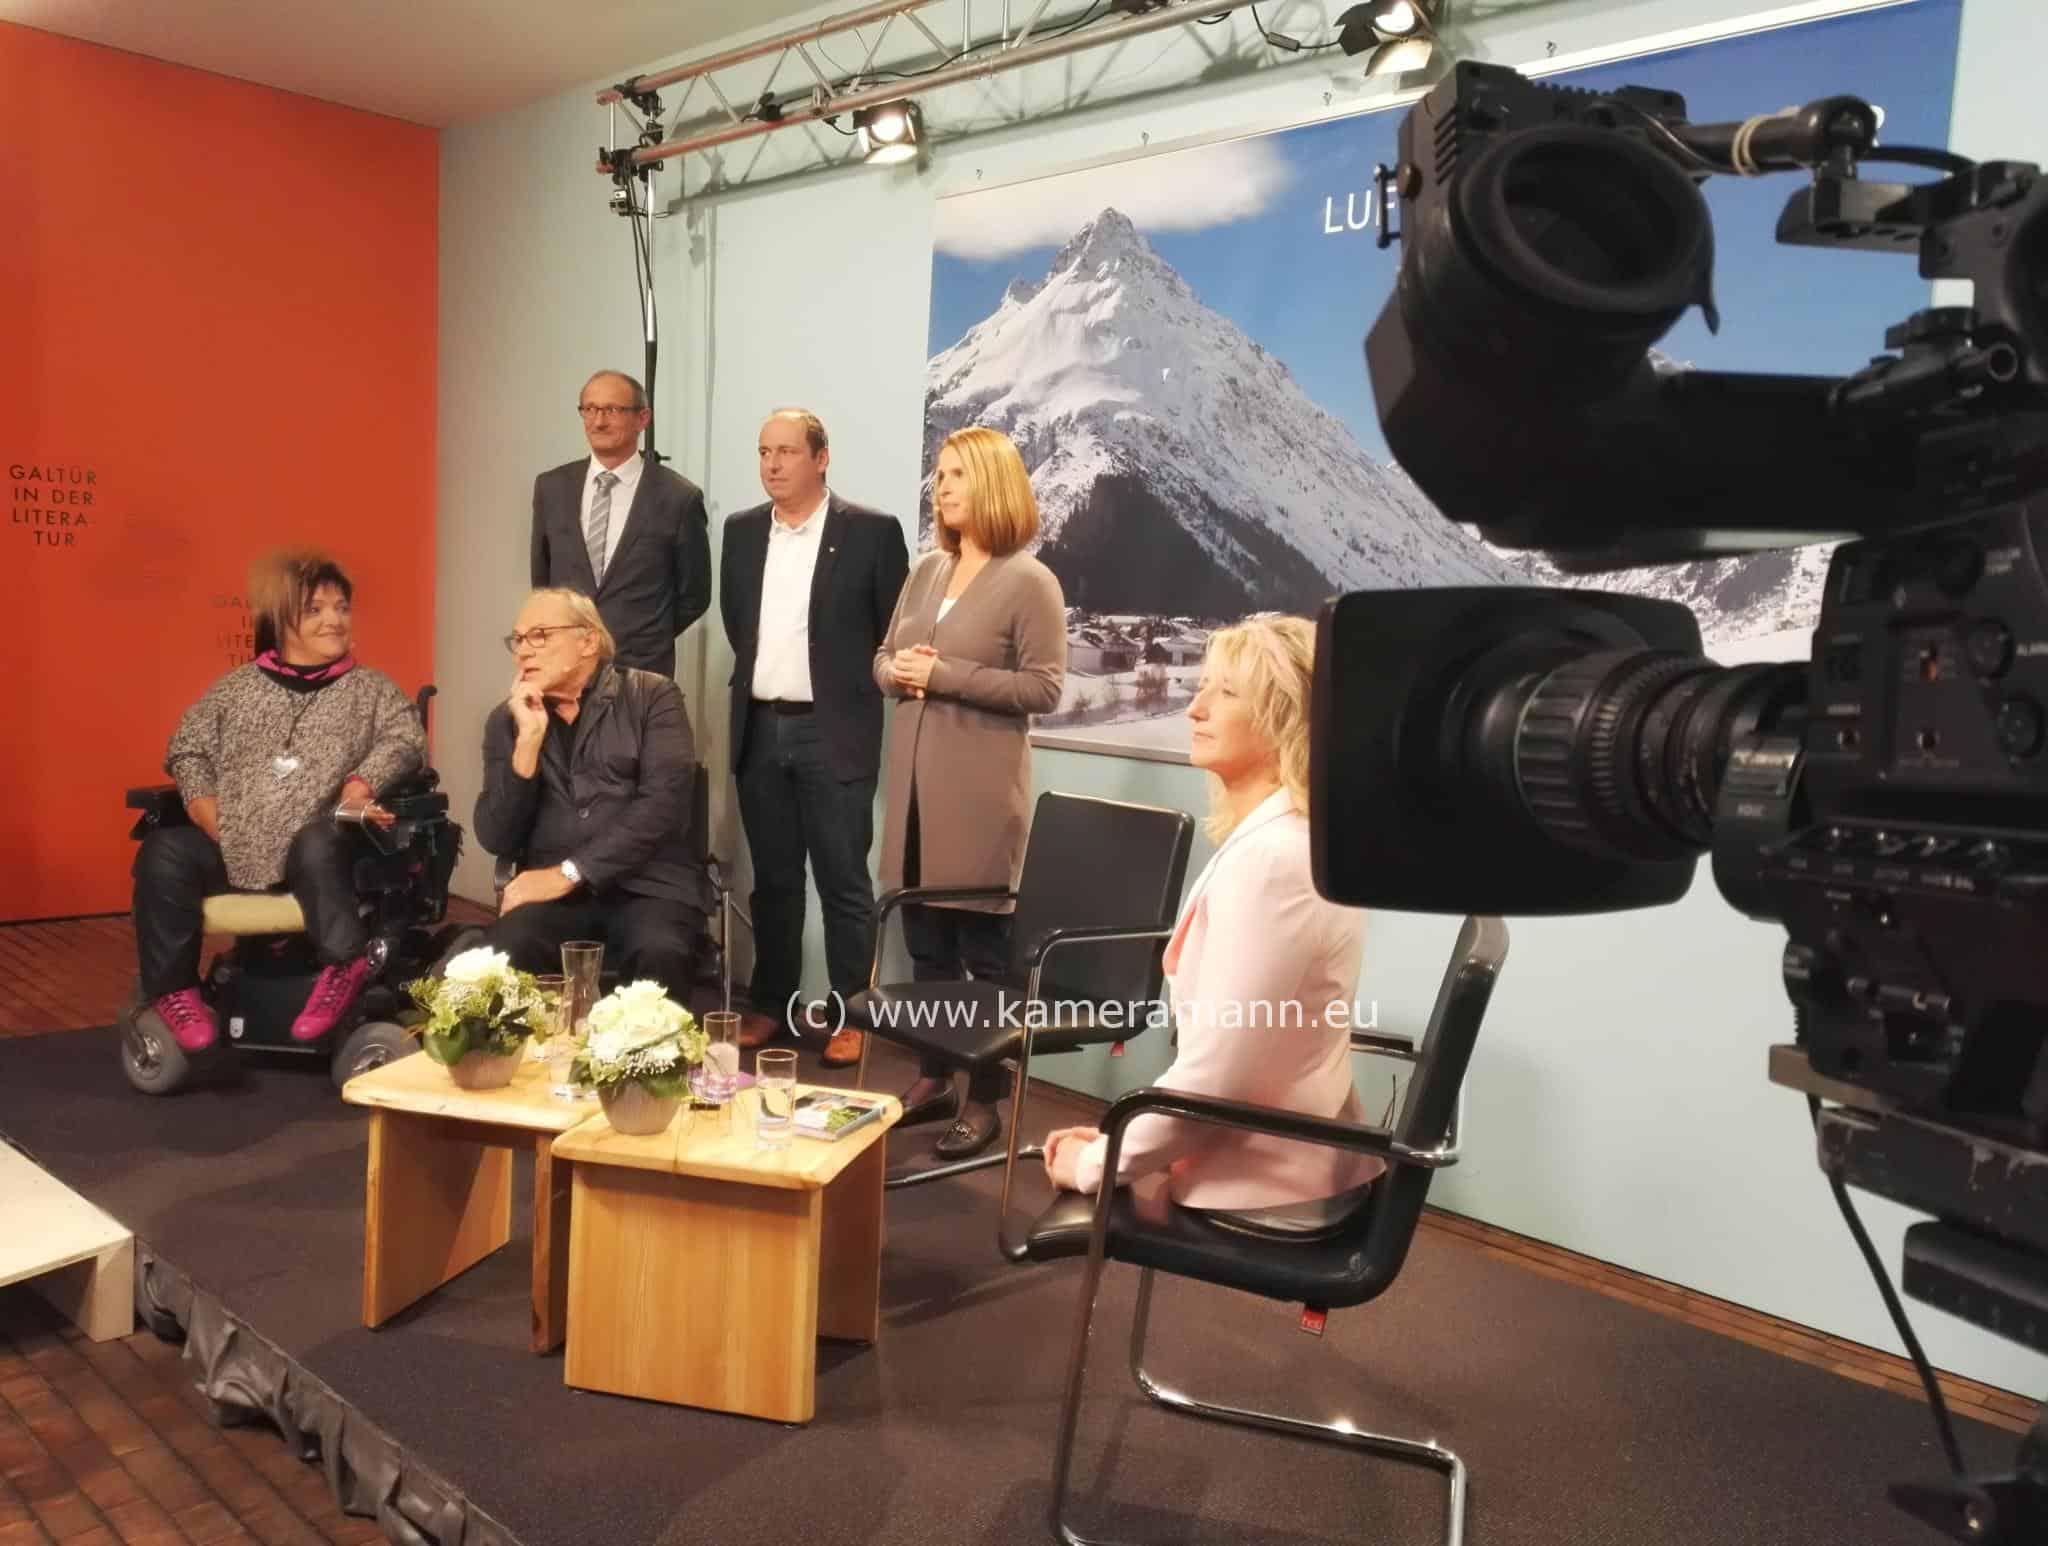 orf 3 gipfelsieg 2 - ORF III - Gipfelsieg